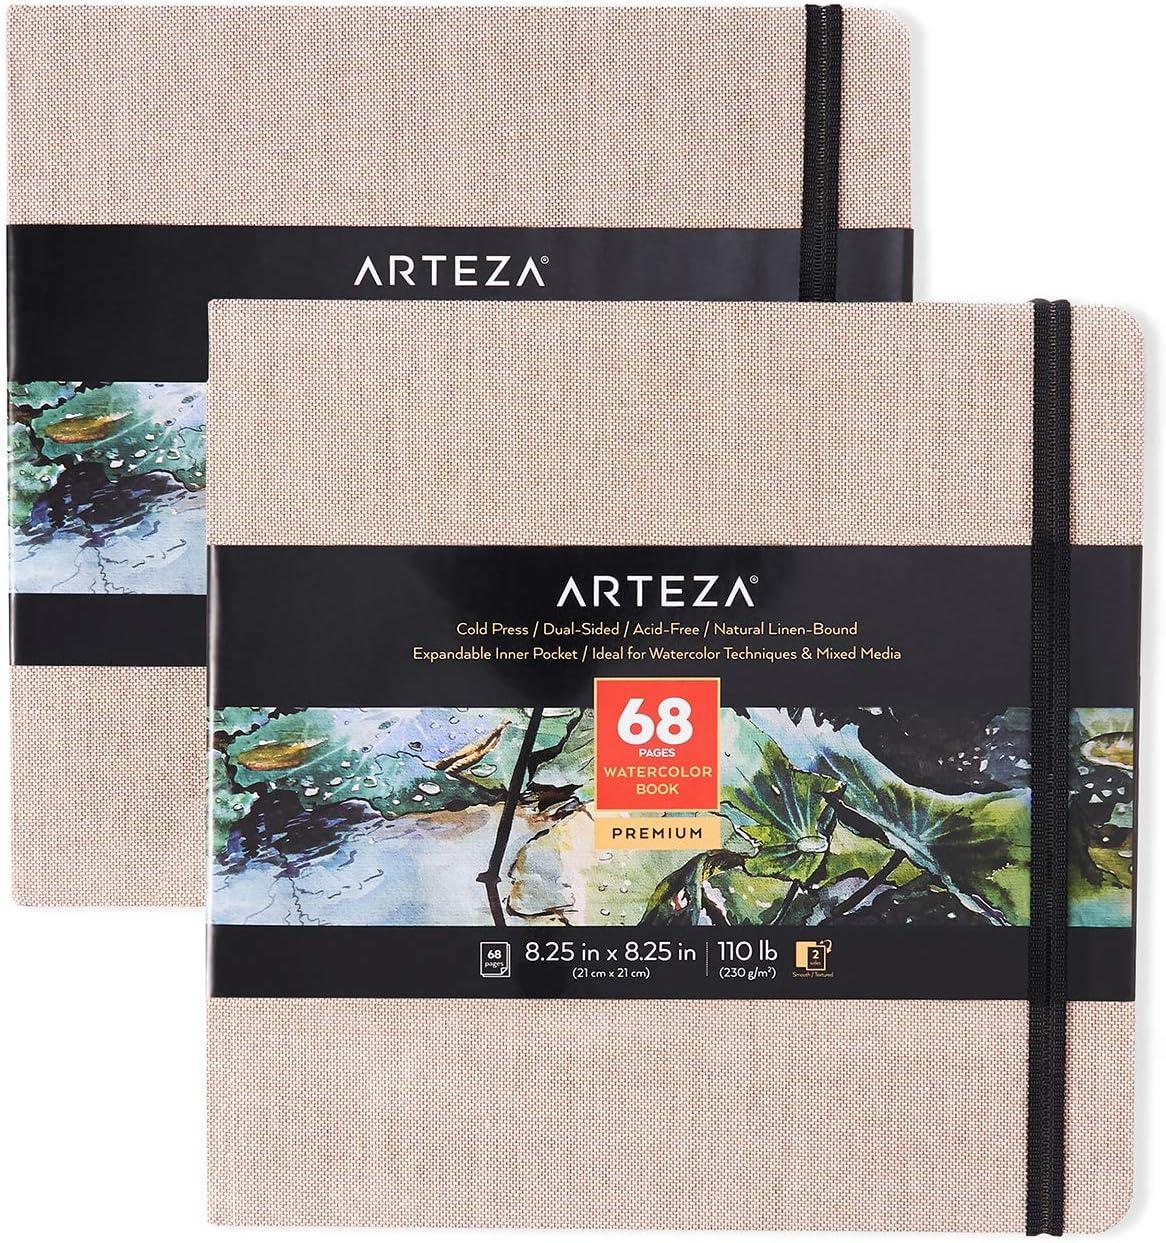 8.25x8.25-inch 68 for Arteza Watercolor Sketchbooks Beige Art Journal 2-Pack